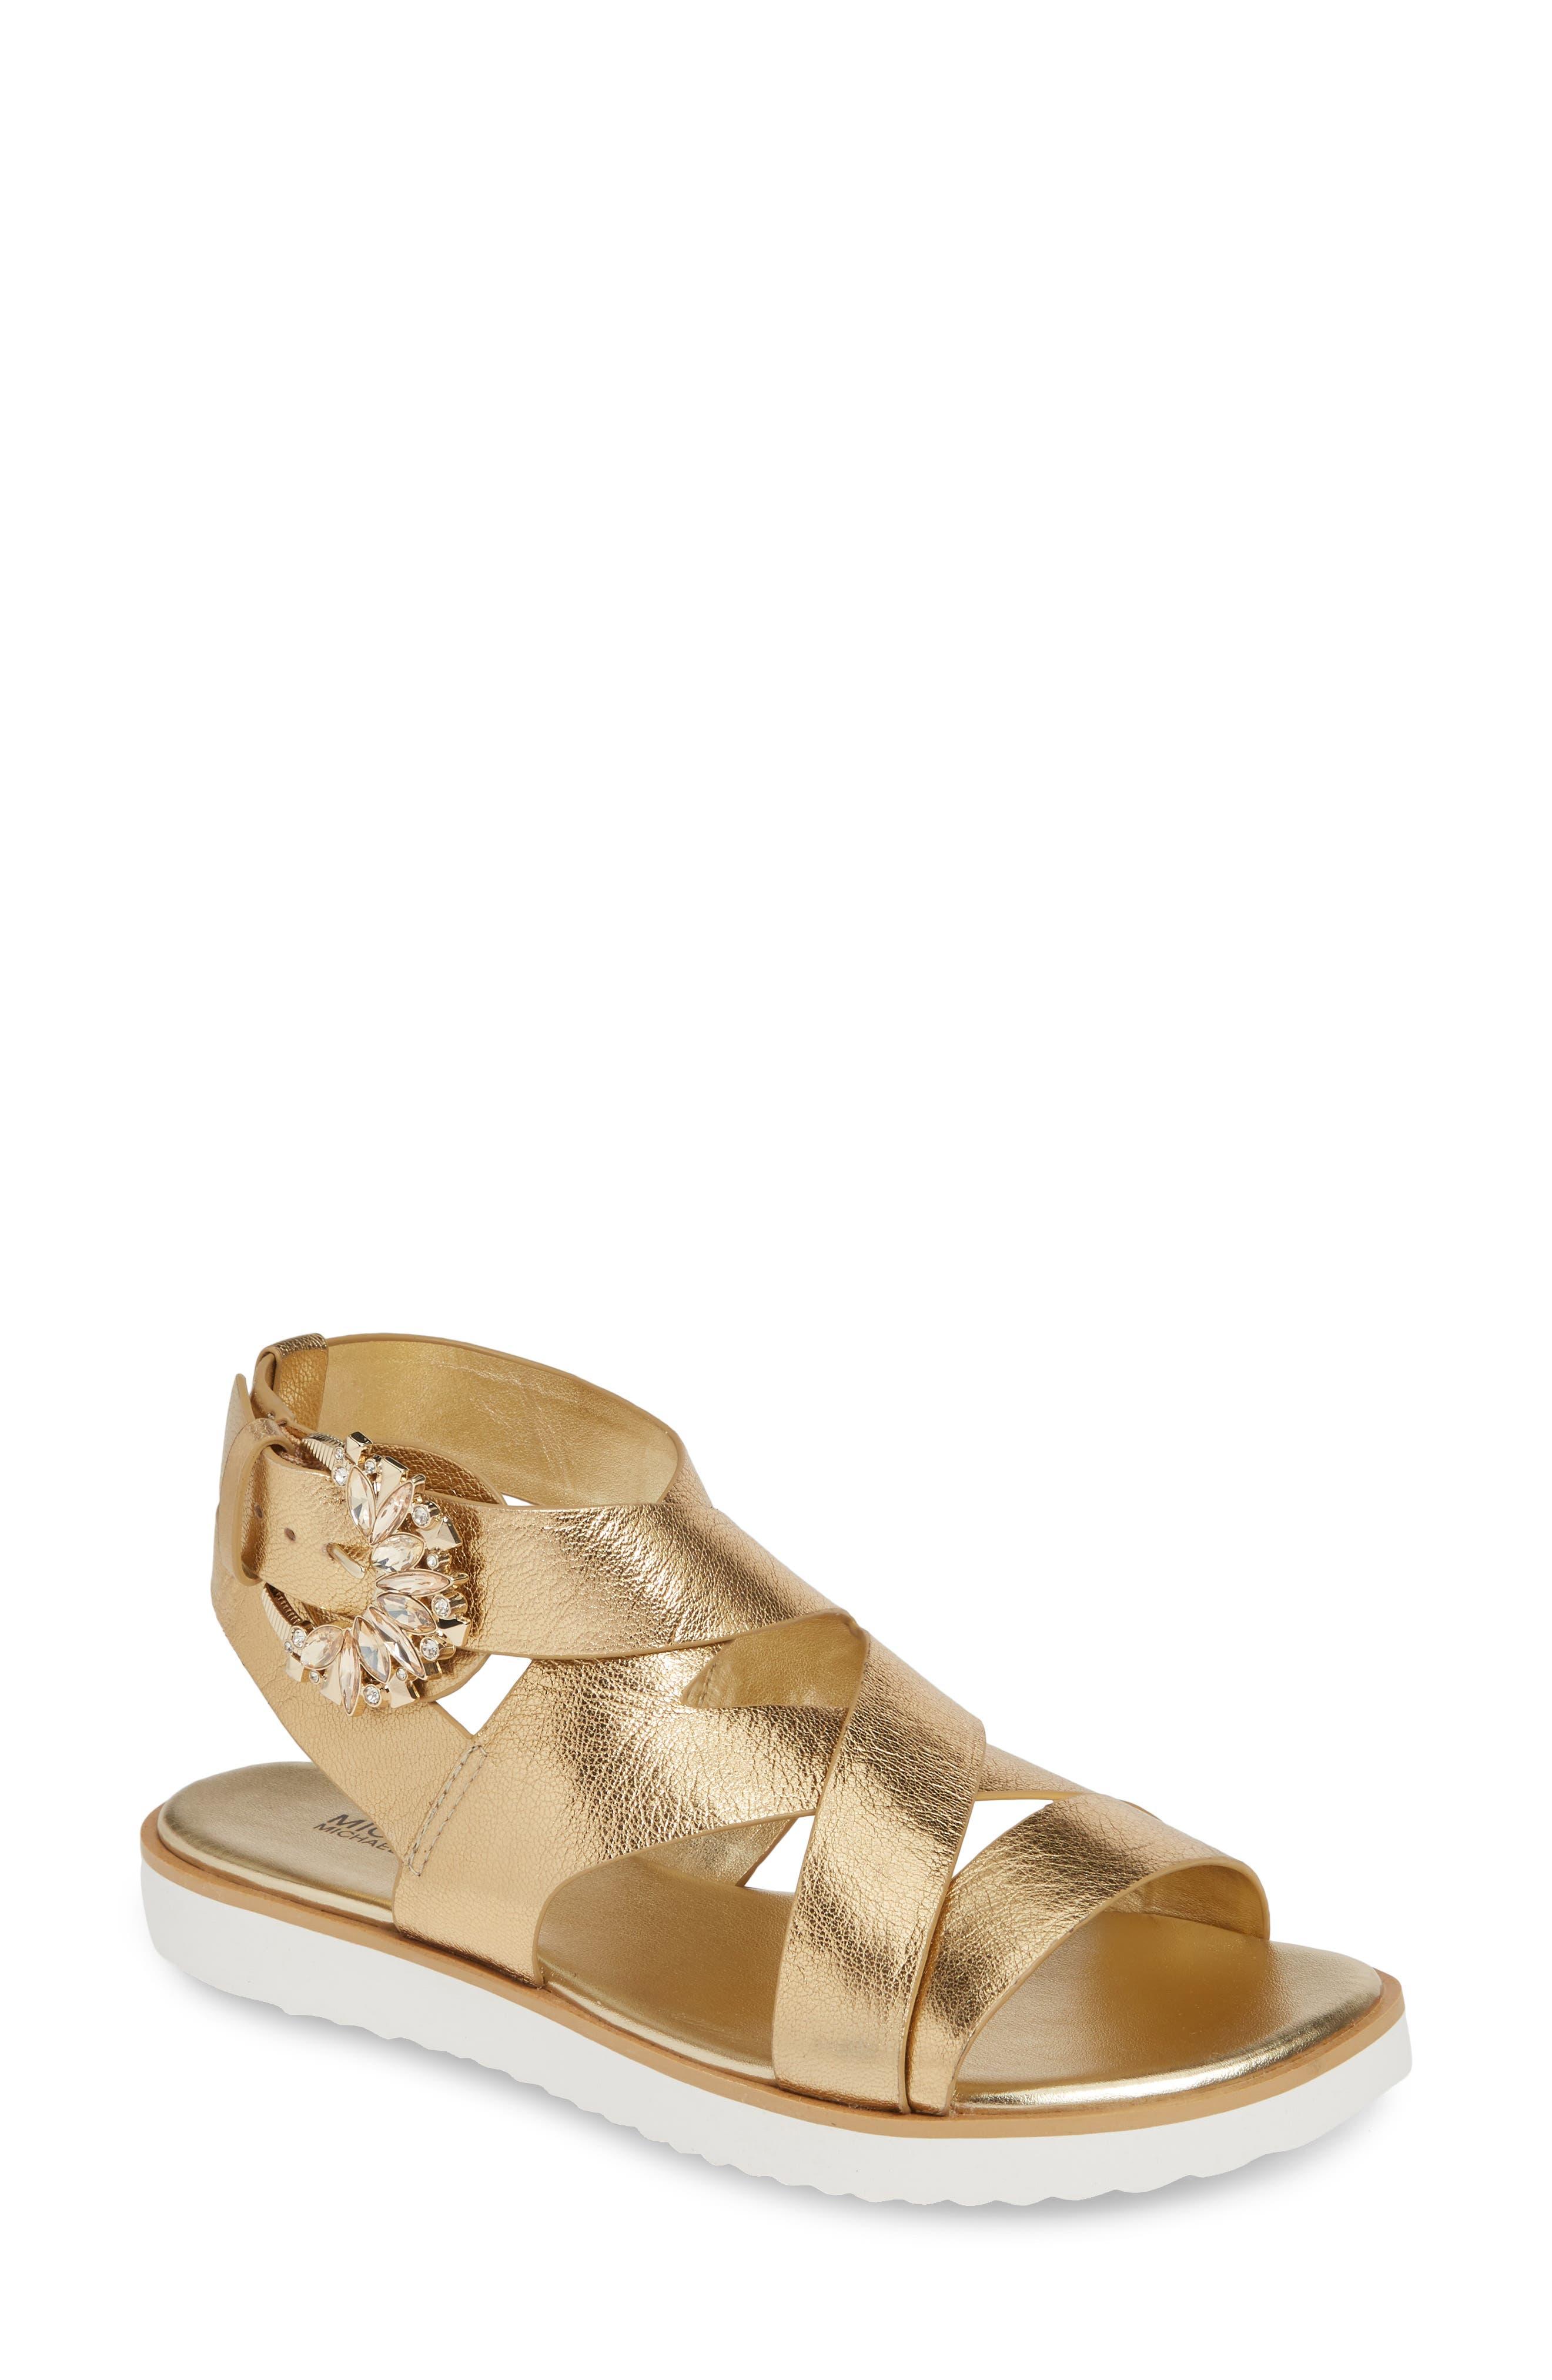 Michael Michael Kors Frieda Strappy Flat Sandal, Metallic